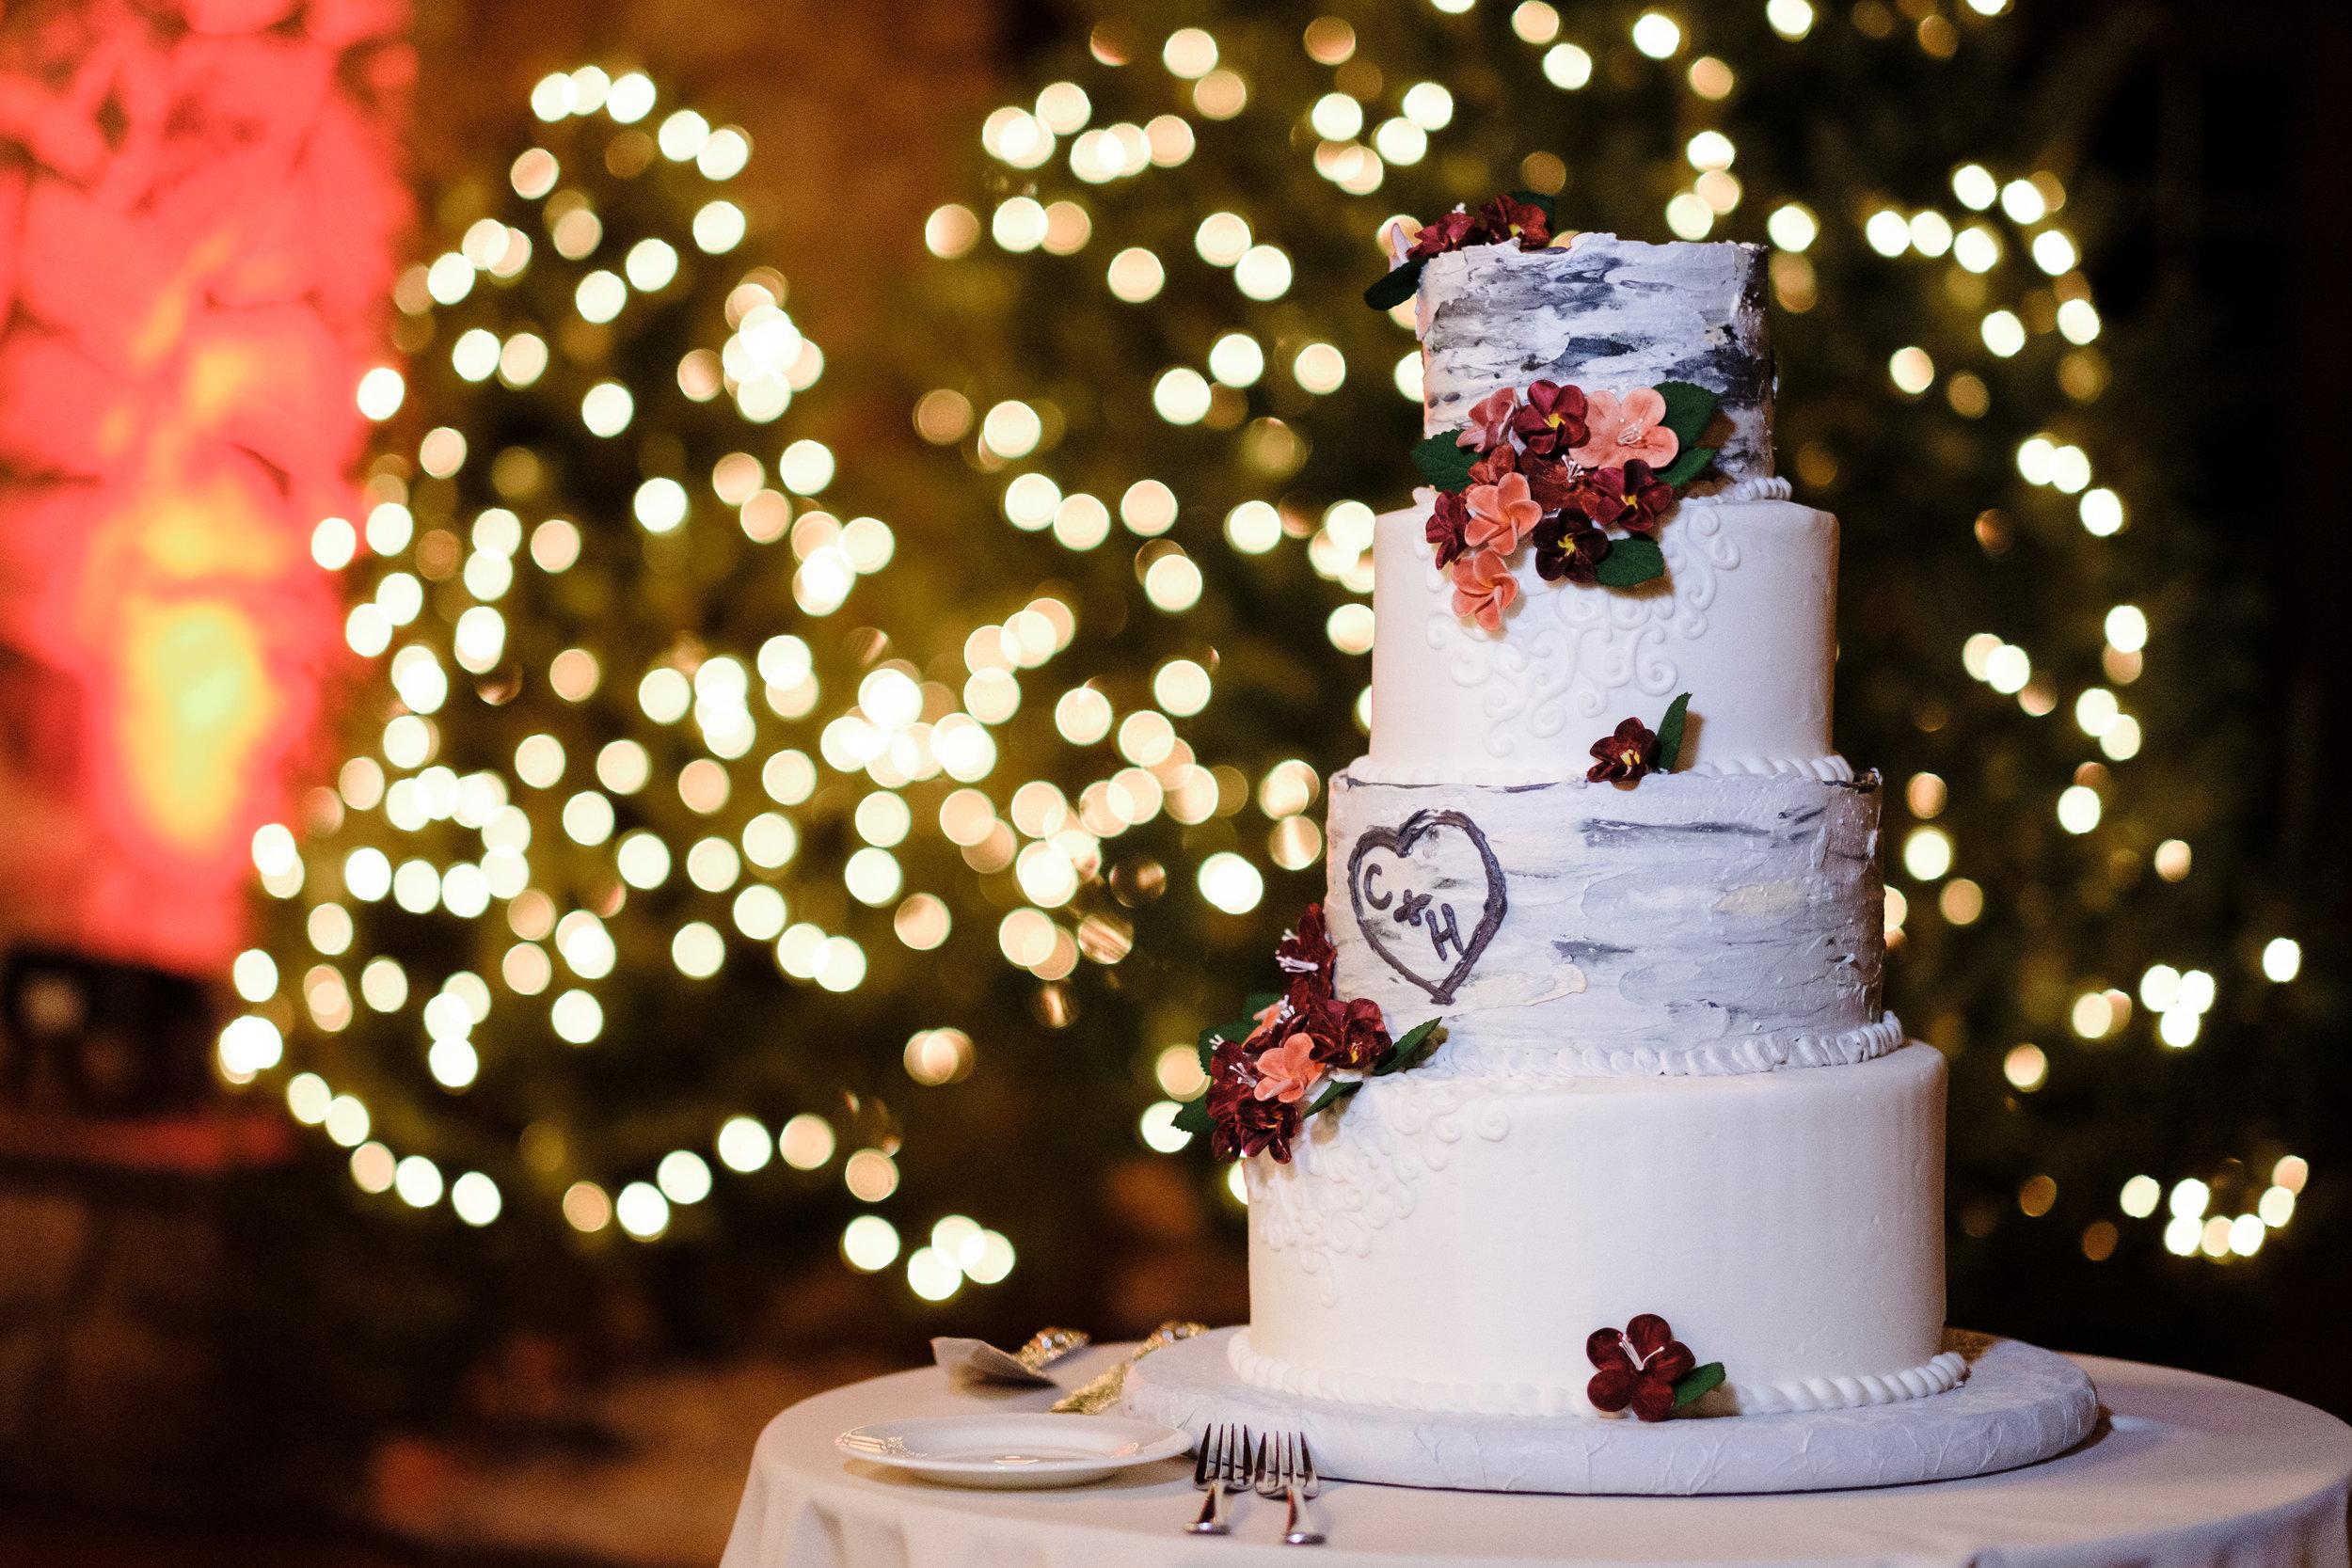 18-12-28 Corinne-Henry-Pavilion-Wedding-397.jpg